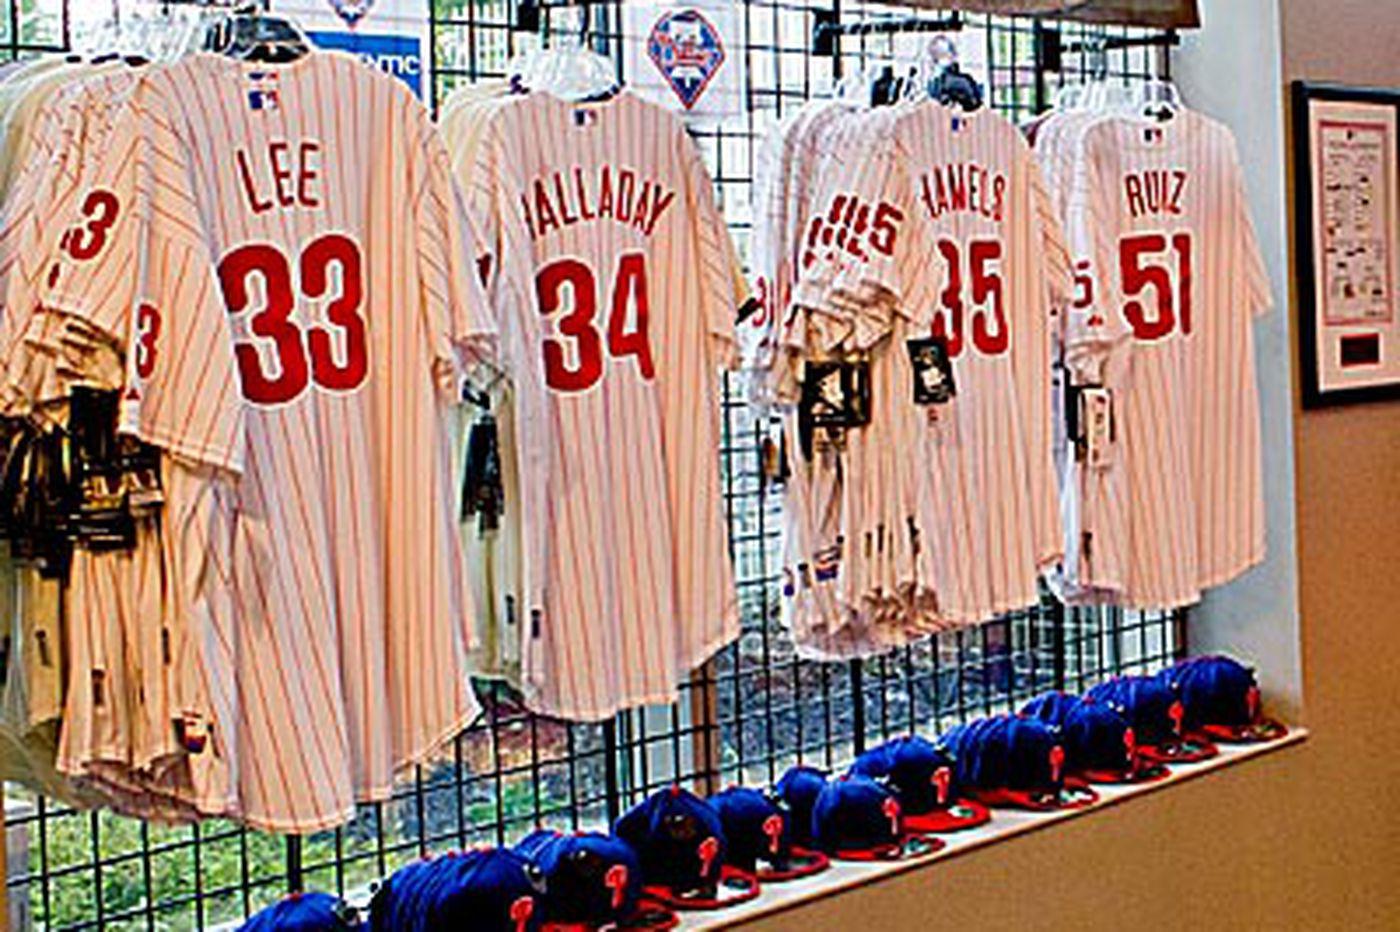 Phillies merchandise sales decline